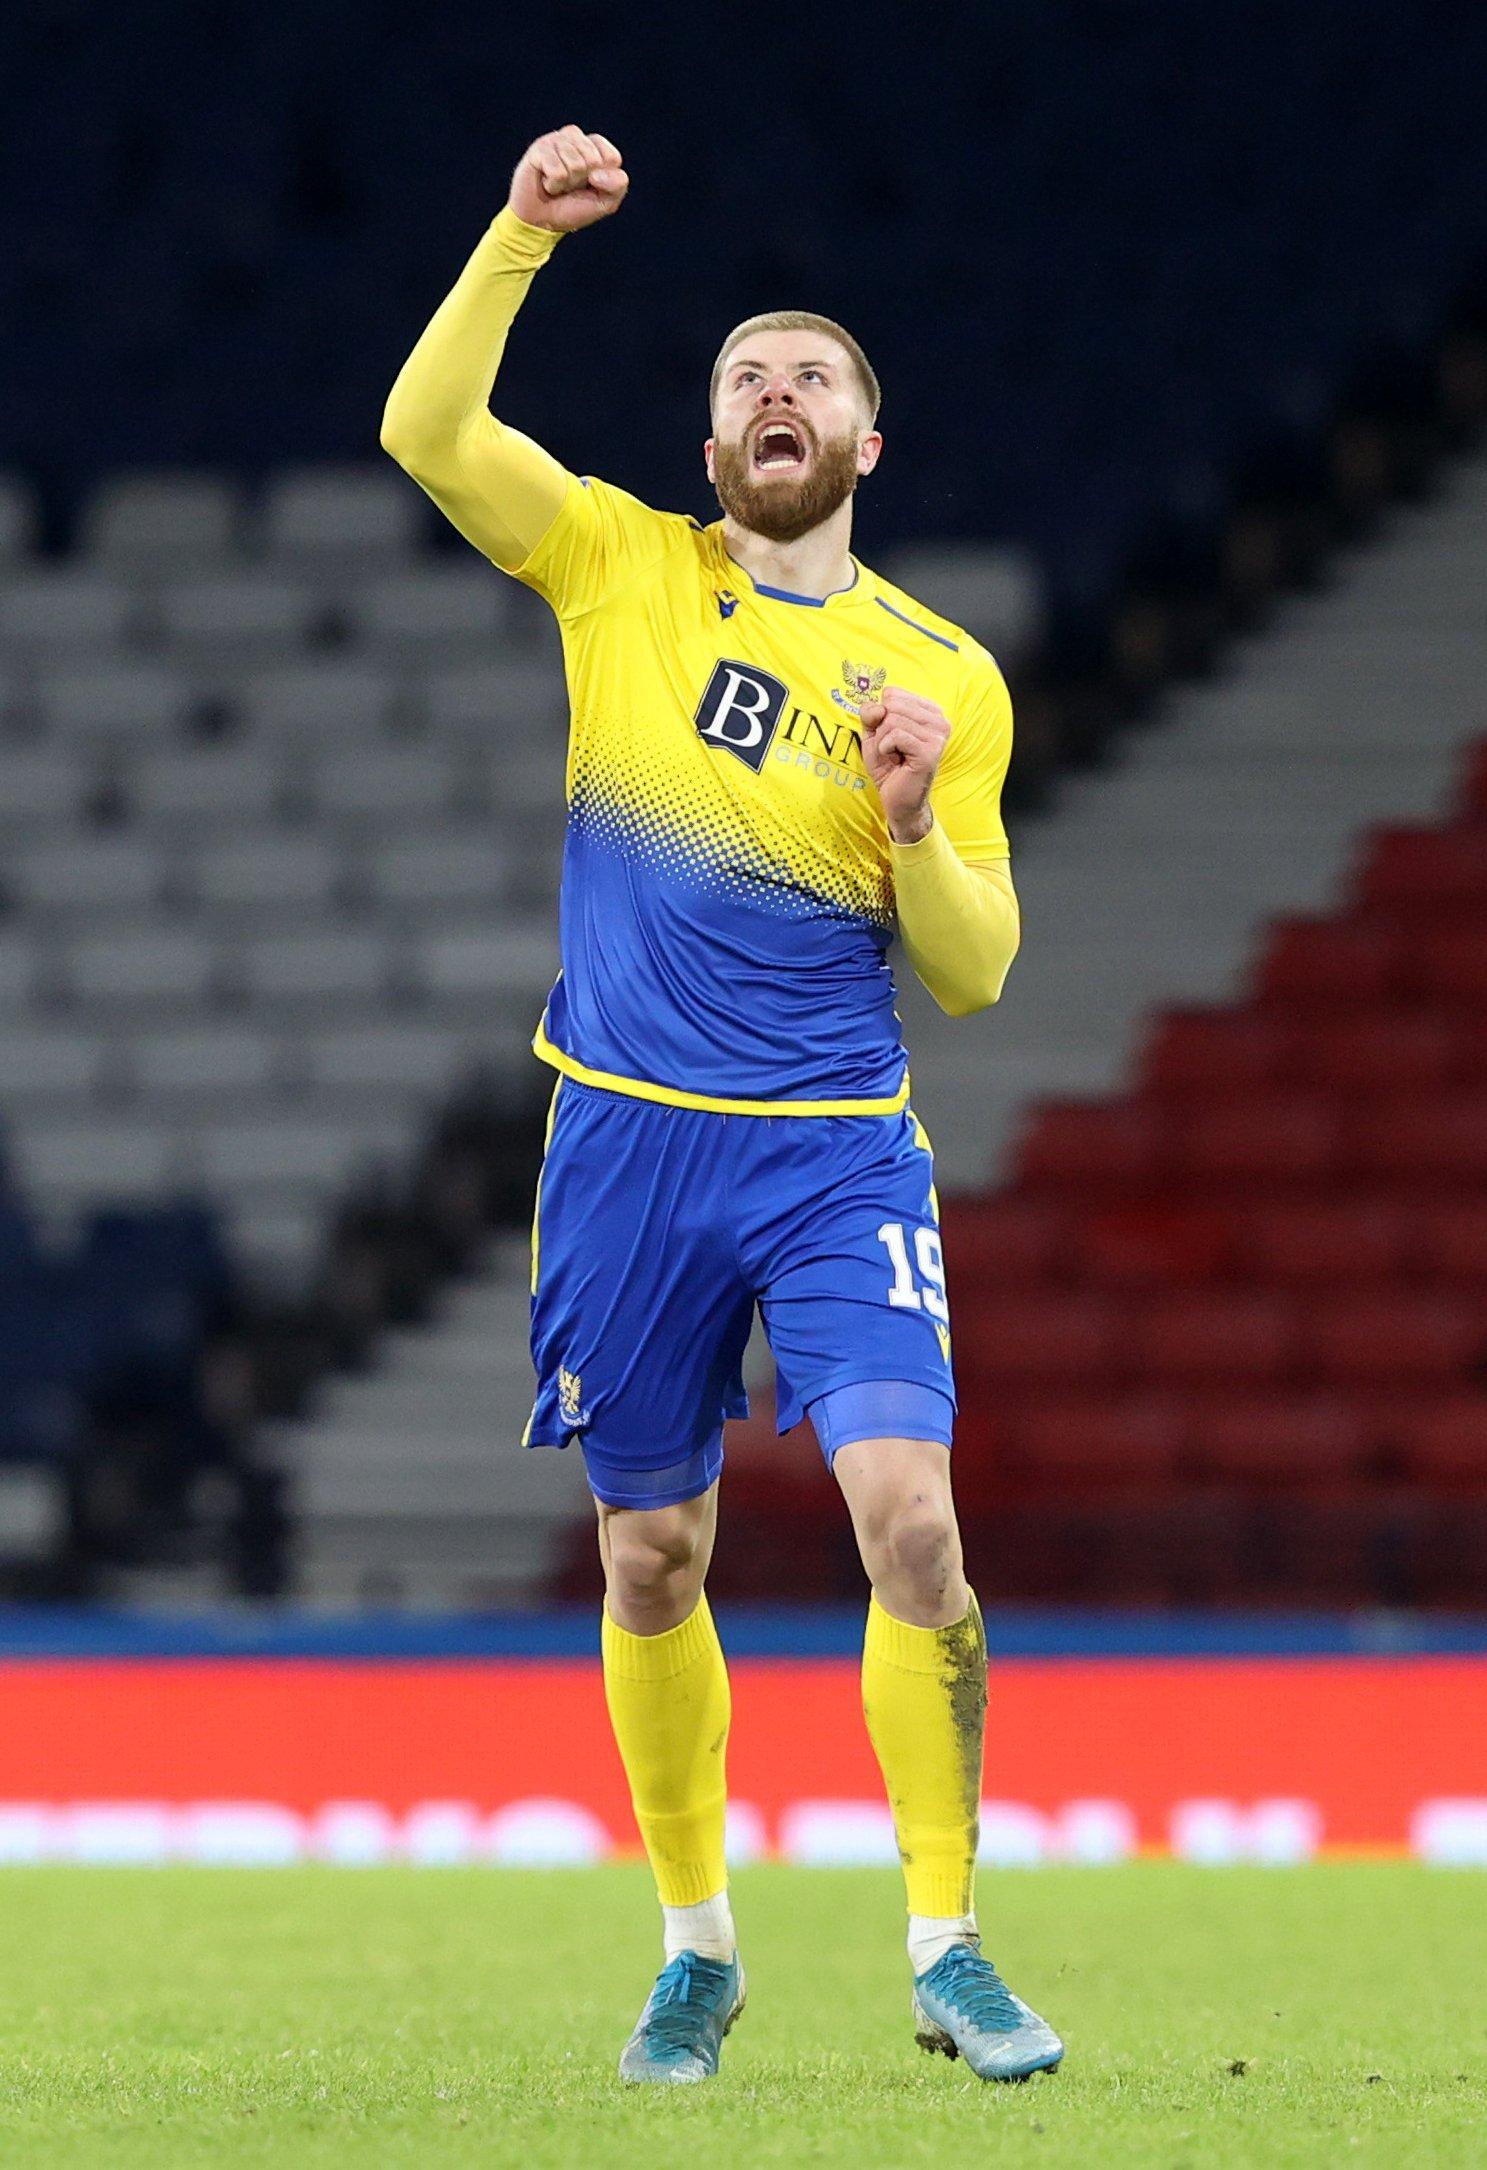 St Johnstone hammer Hibernian to reach Betfred Cup final